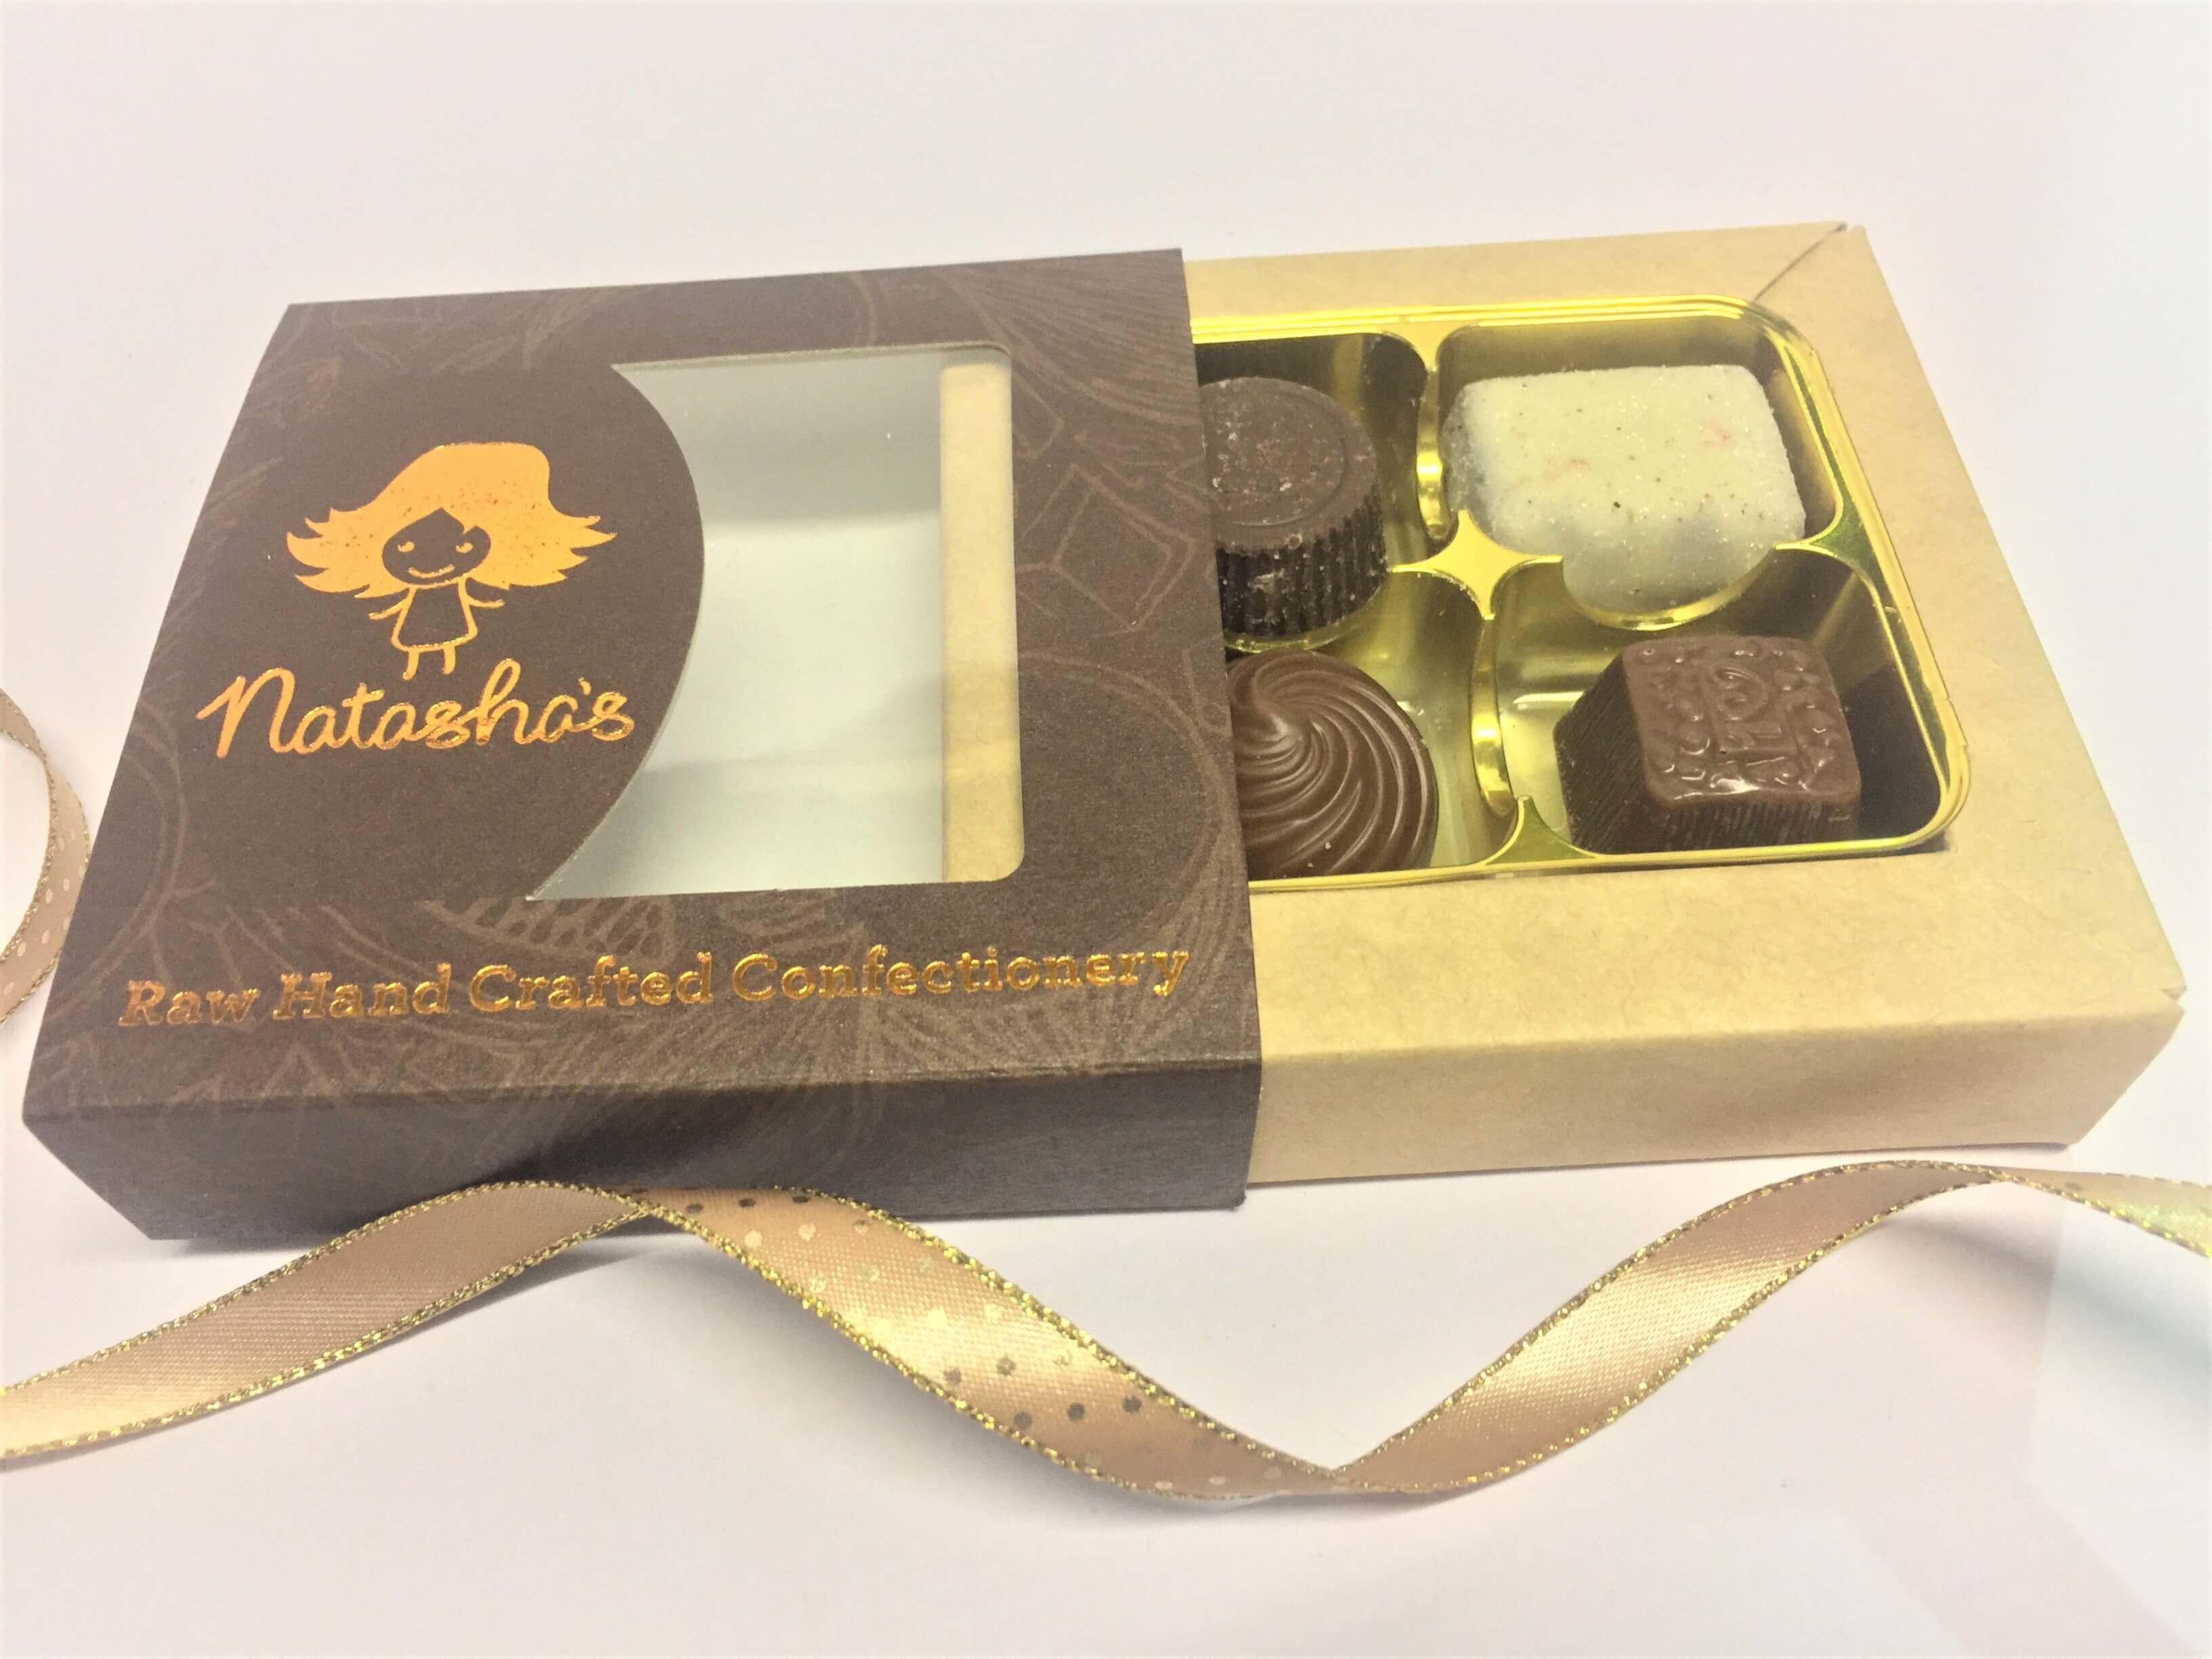 Bespoke Chocolate Slider Boxes 4 Pack